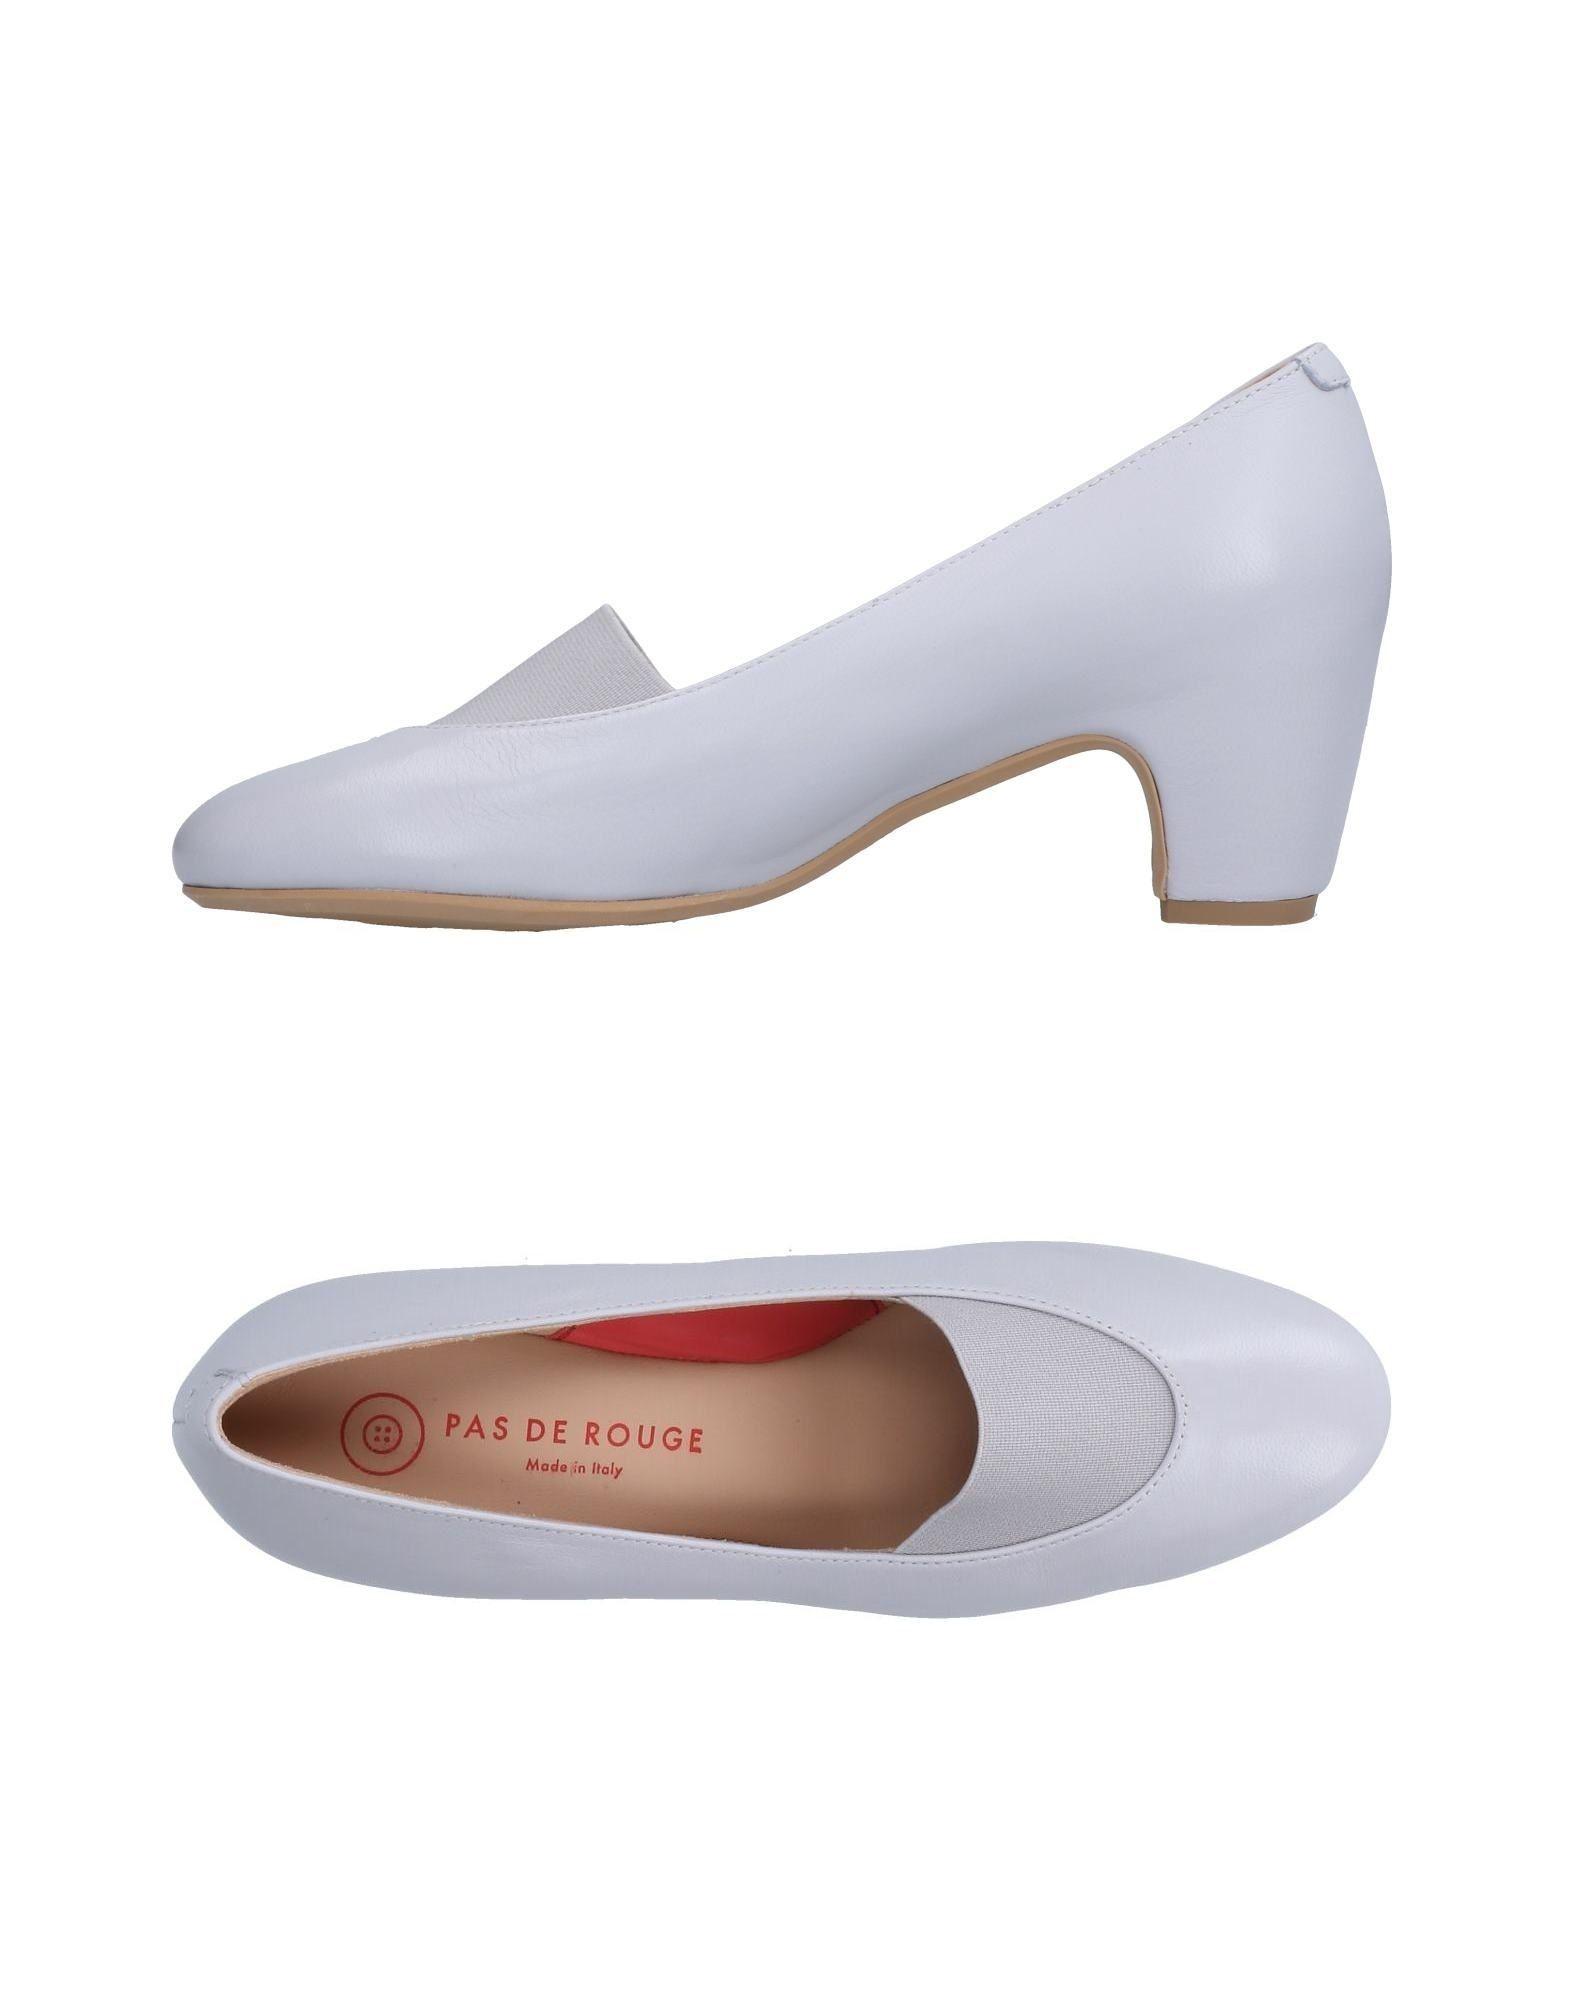 Pas De Damen Rouge Pumps Damen De  11510765HJ Neue Schuhe 4cafdd